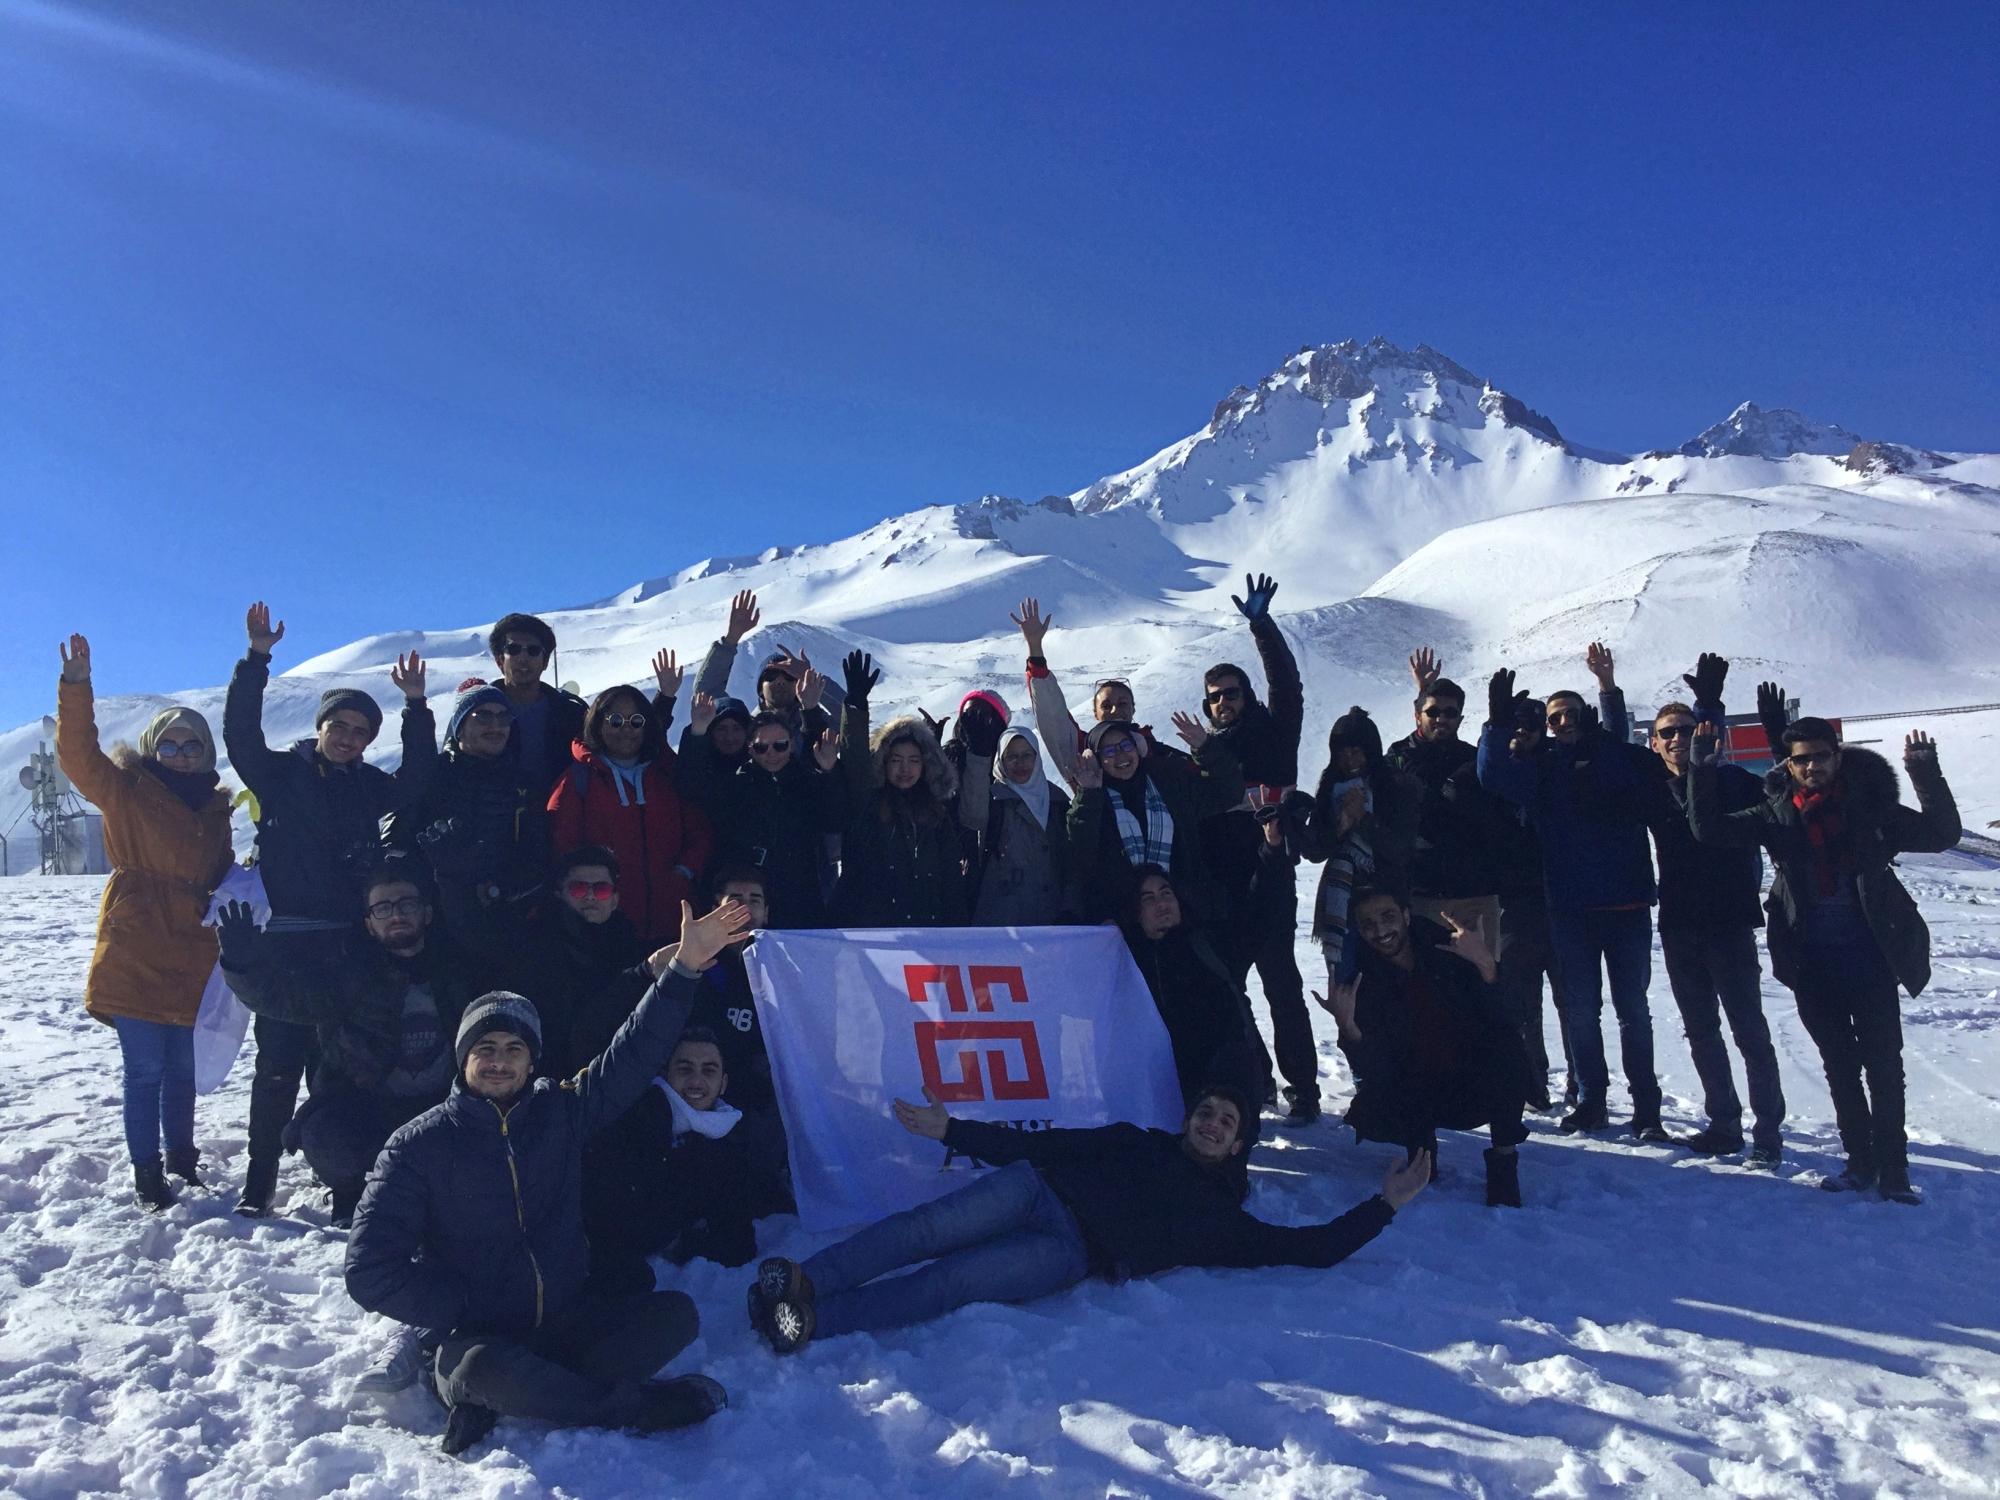 Abdullah Gül University, International Office, international students, ski, trip, snowboarding, Erciyes